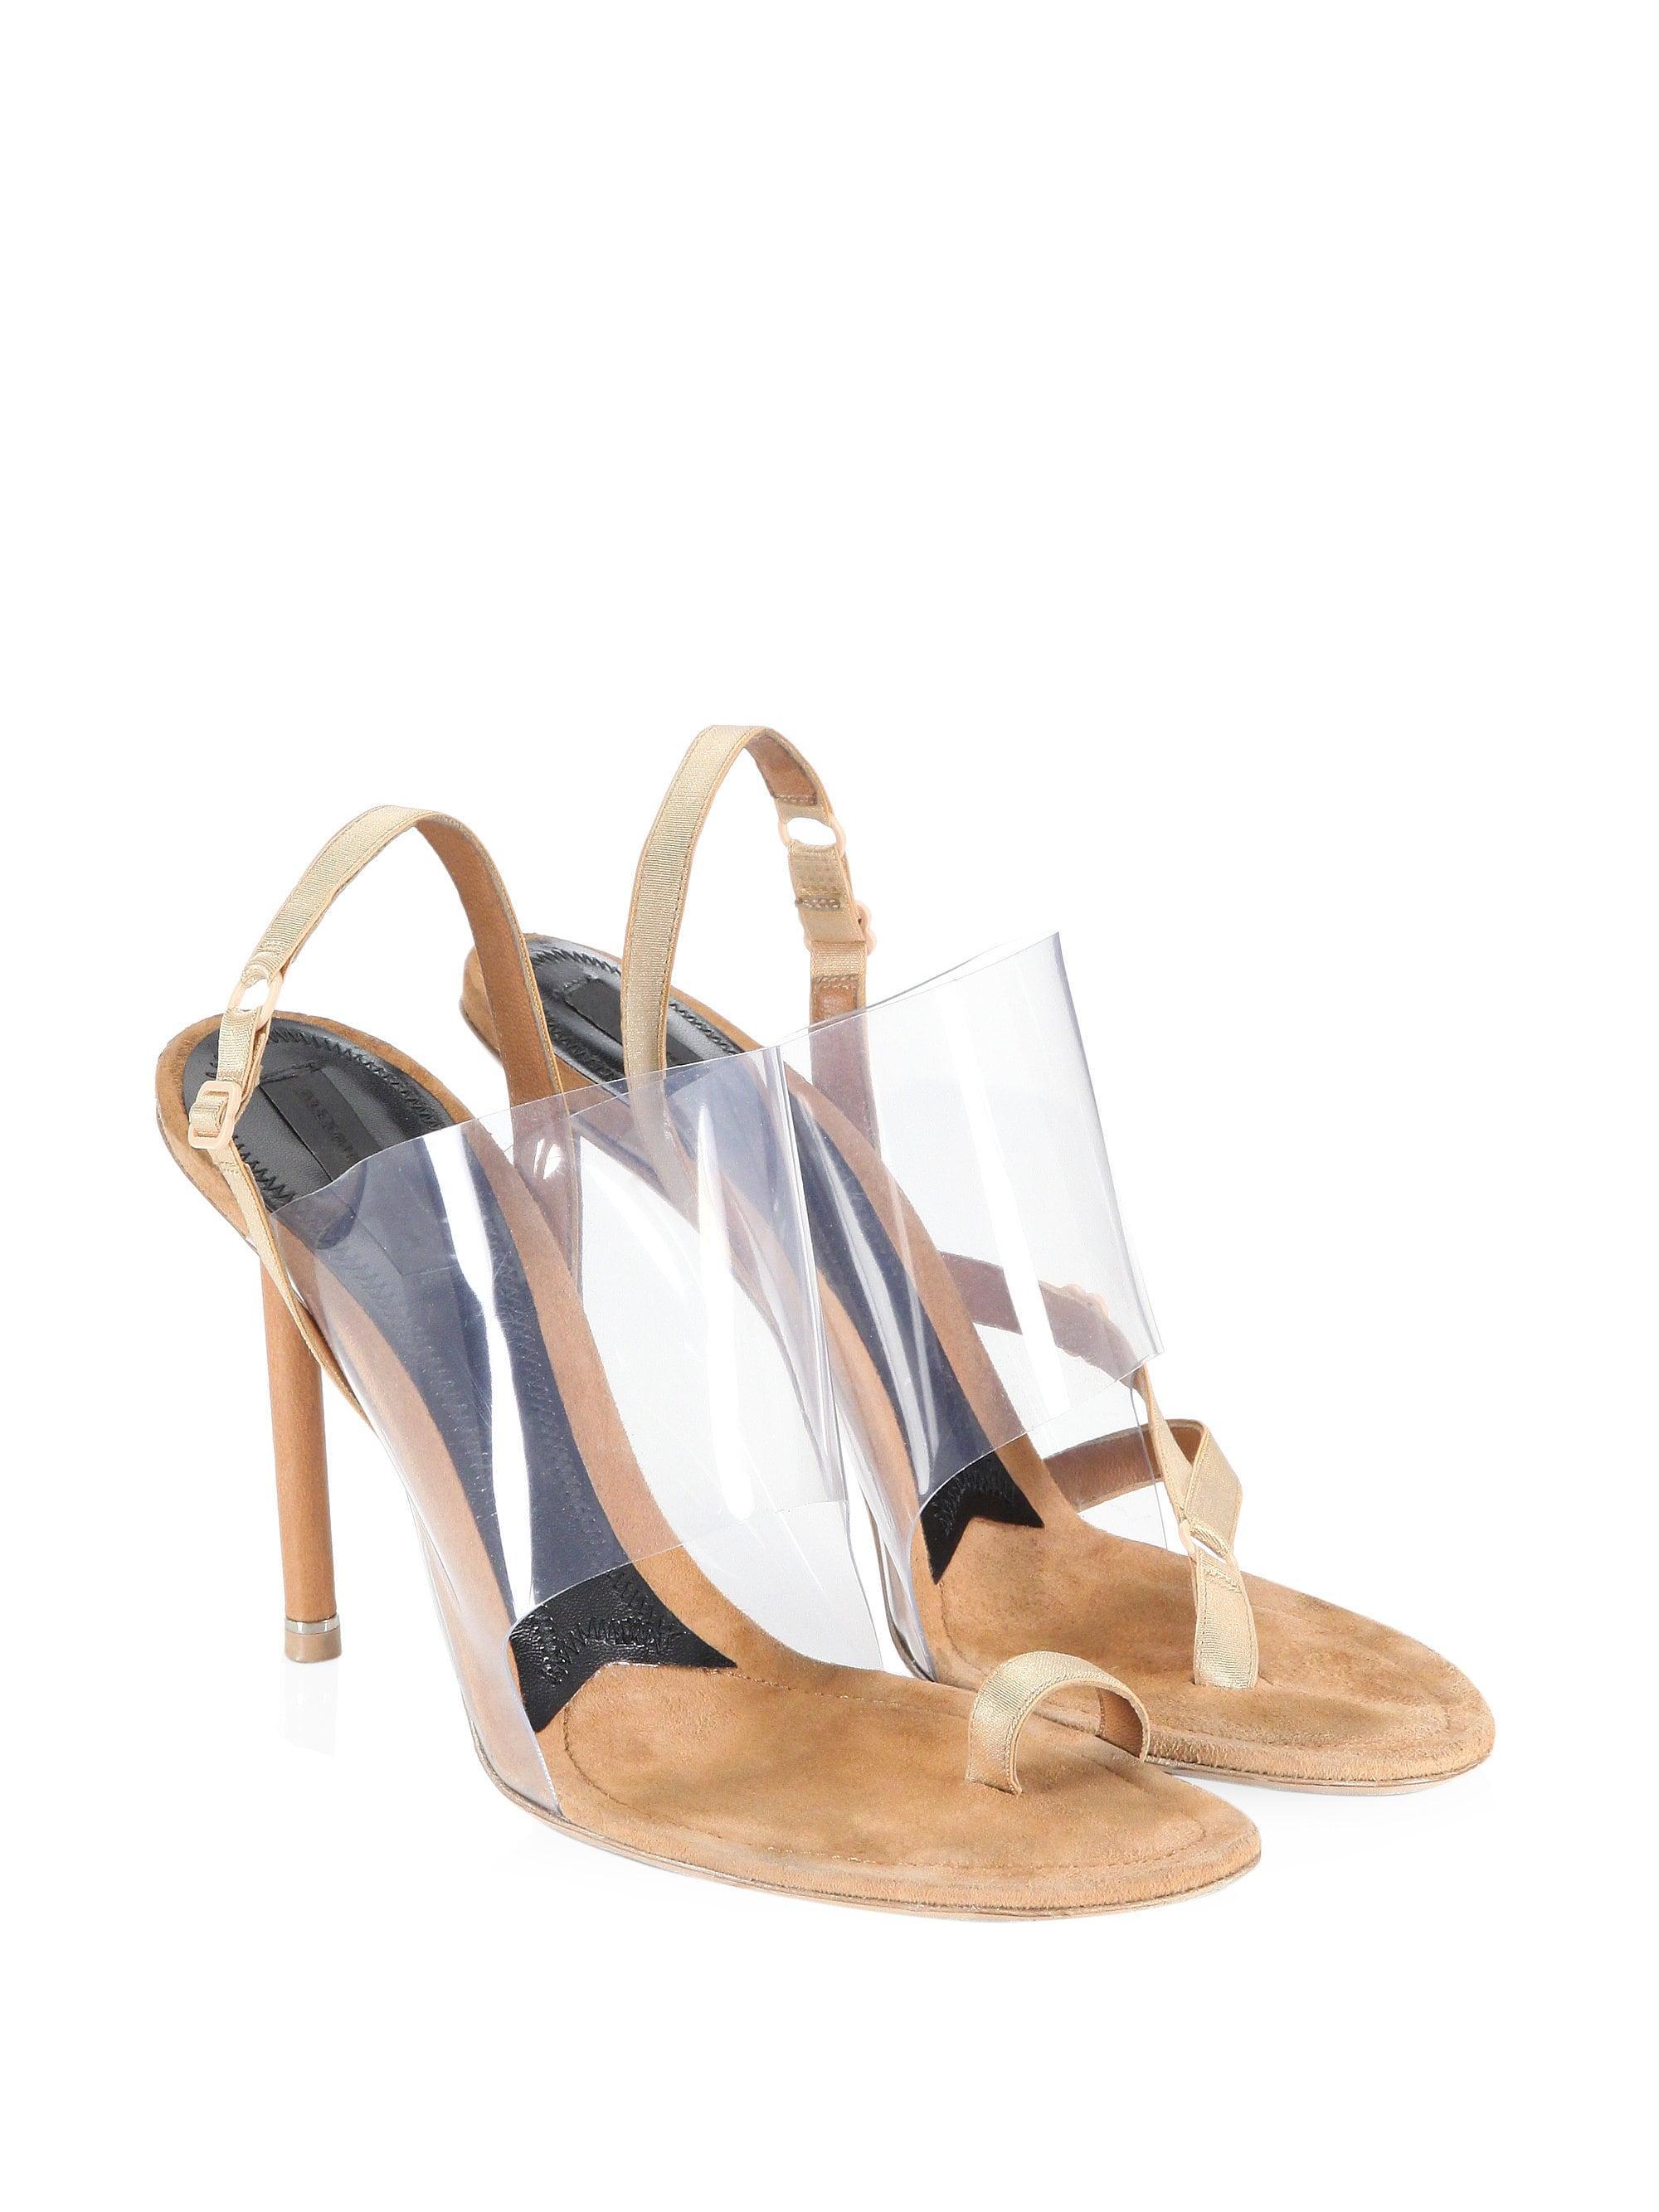 417f792adeb Lyst - Alexander Wang Kaia Pvc High Heel Sandals